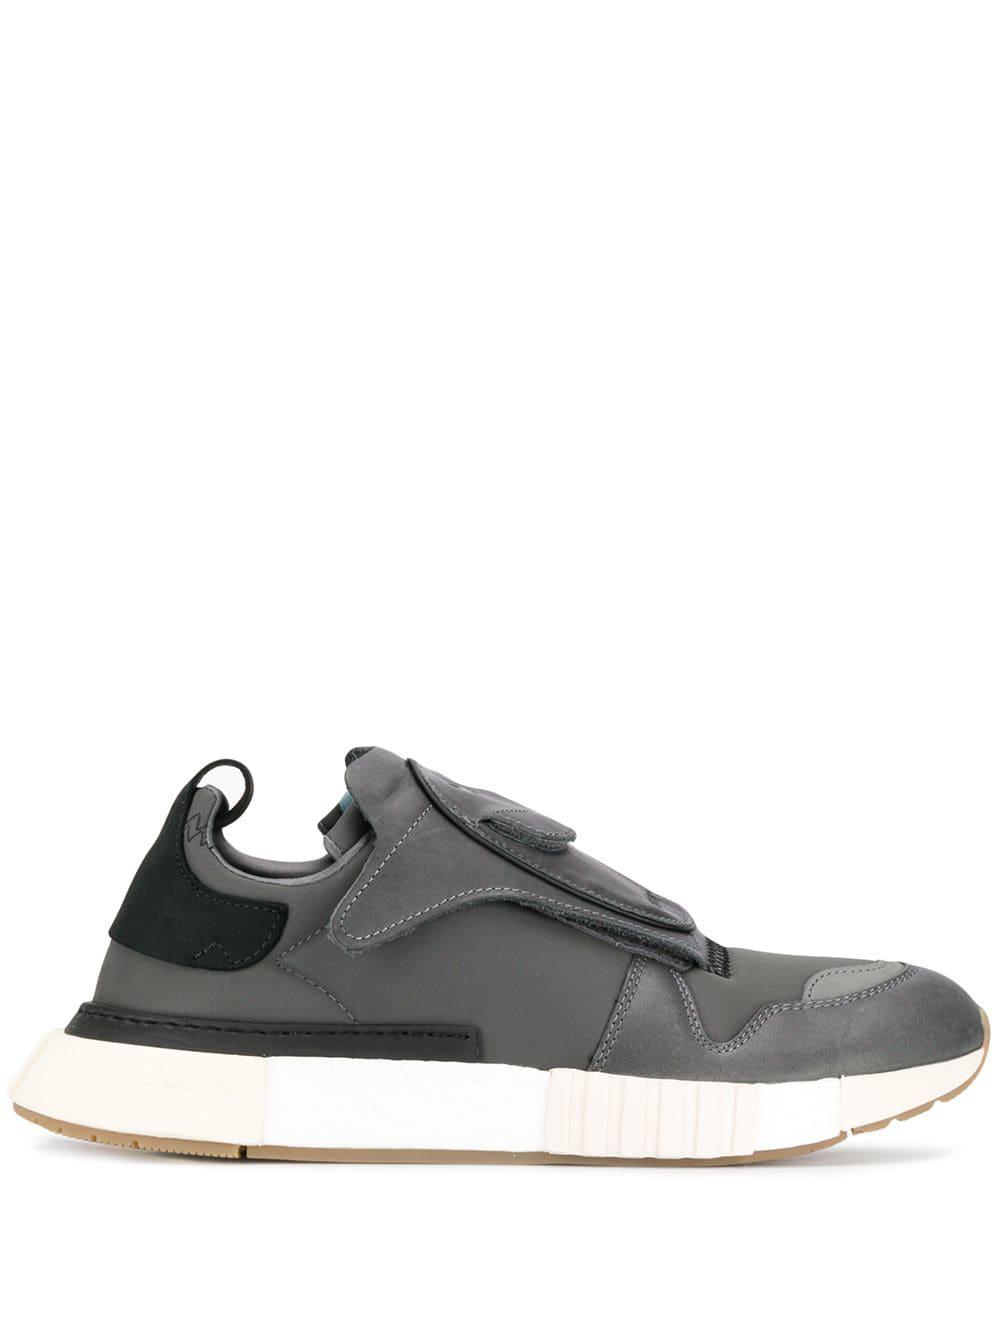 64198f1a2665f Adidas Originals Adidas Futurepacer Sneakers - Grey